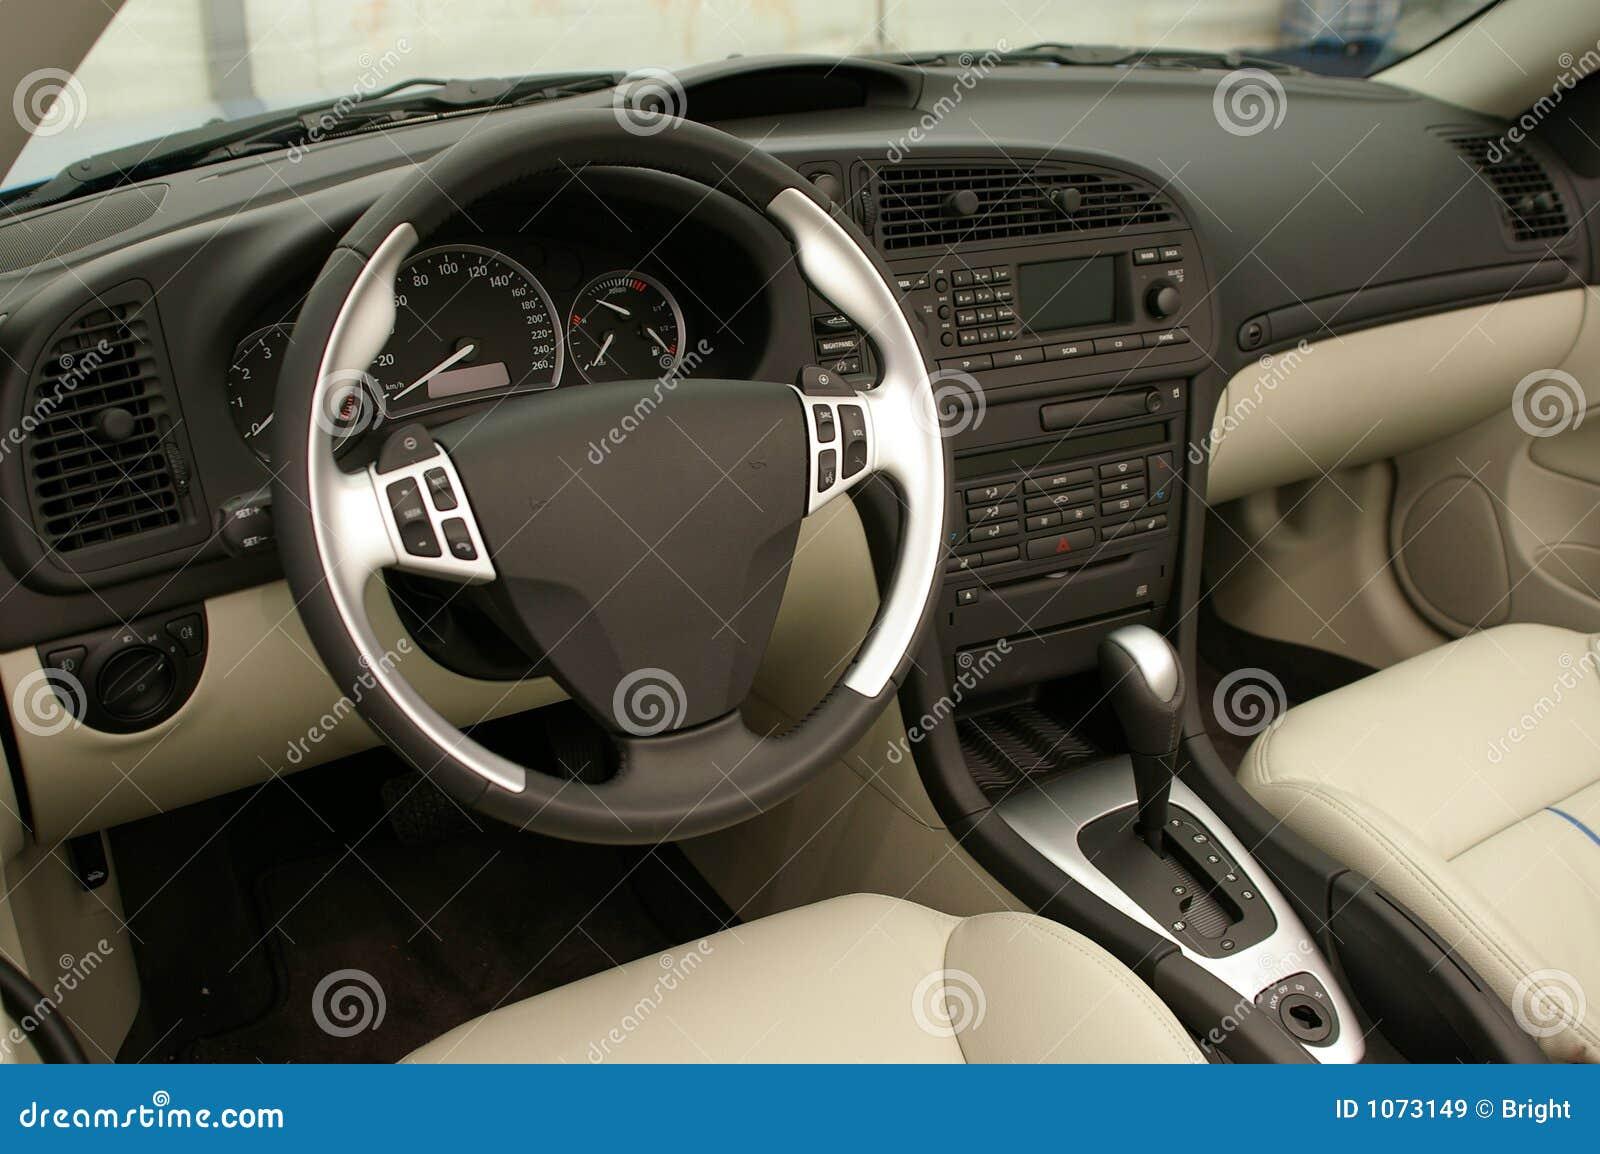 car interior royalty free stock images image 1073149. Black Bedroom Furniture Sets. Home Design Ideas